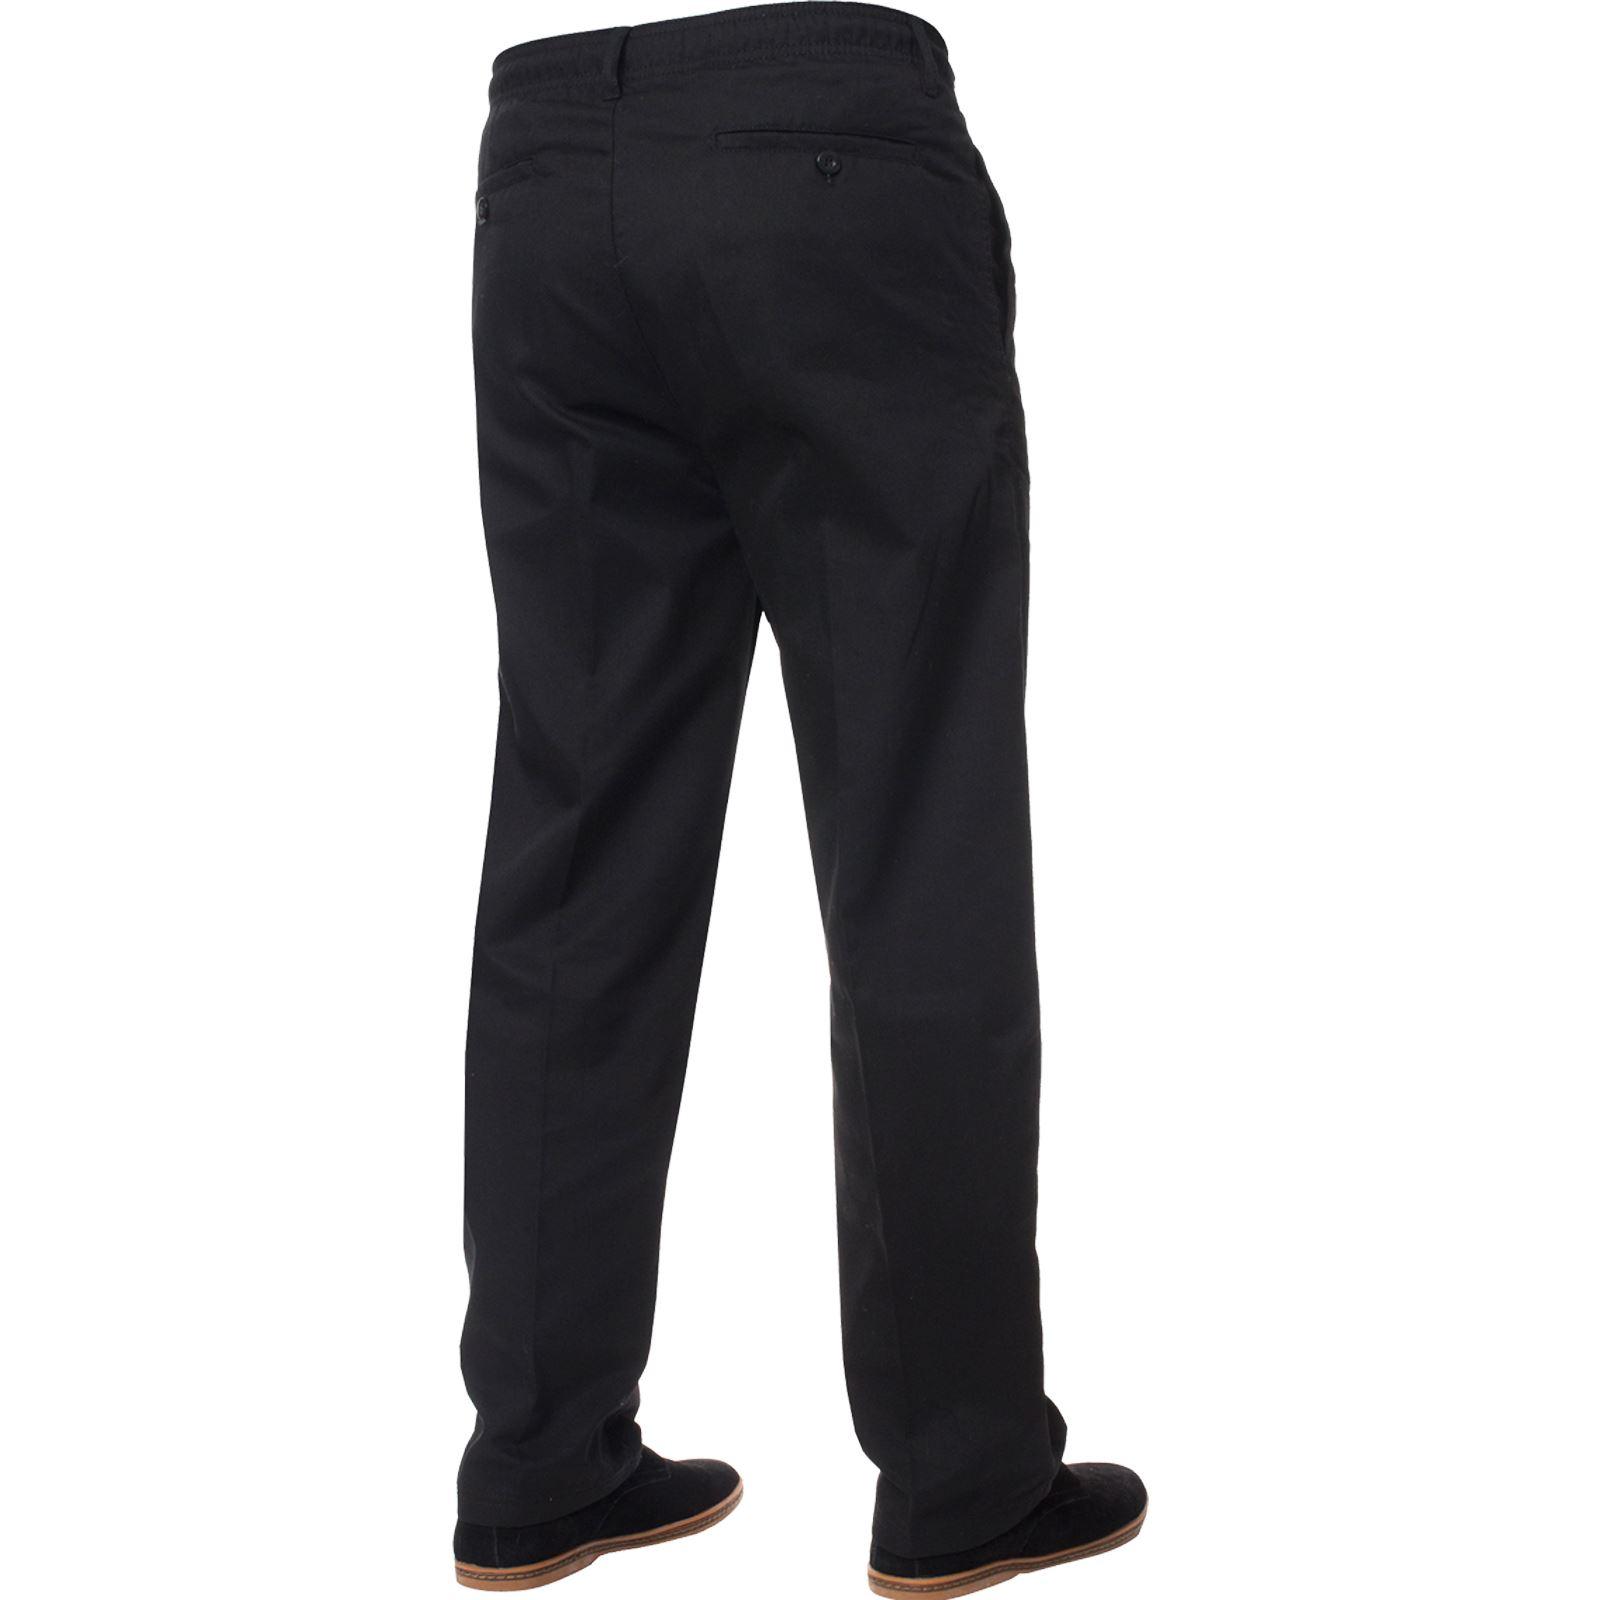 Para-Hombres-Pantalones-De-Rugby-Kruze-cintura-elastica-con-cordon-pantalones-REGULAR-King-Tamanos miniatura 6